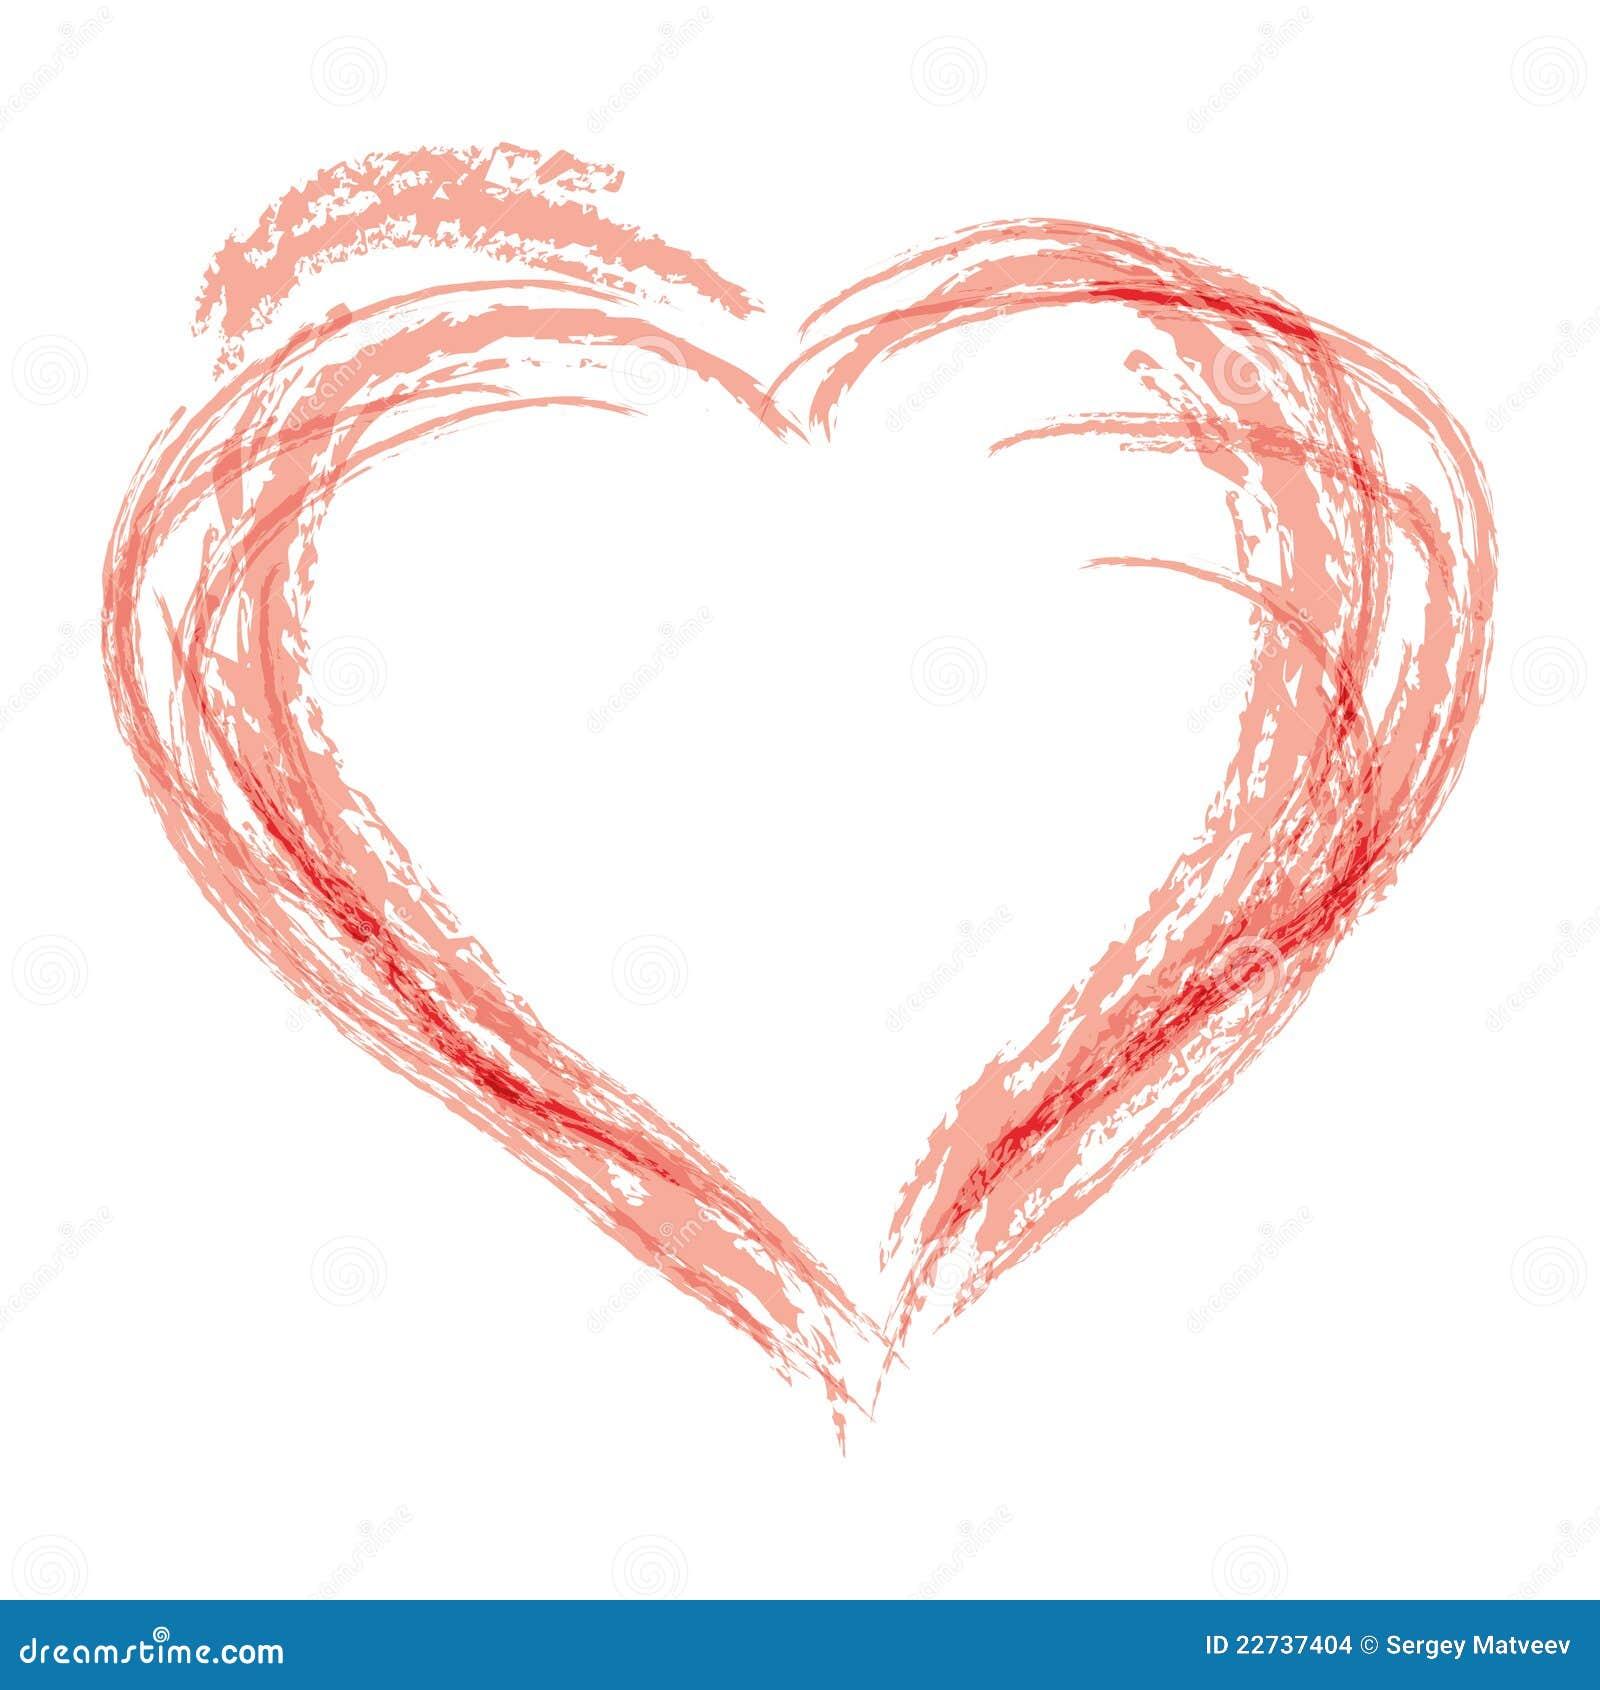 Hand Draw Heart Symbol Stock Vector Illustration Of Monotone 22737404